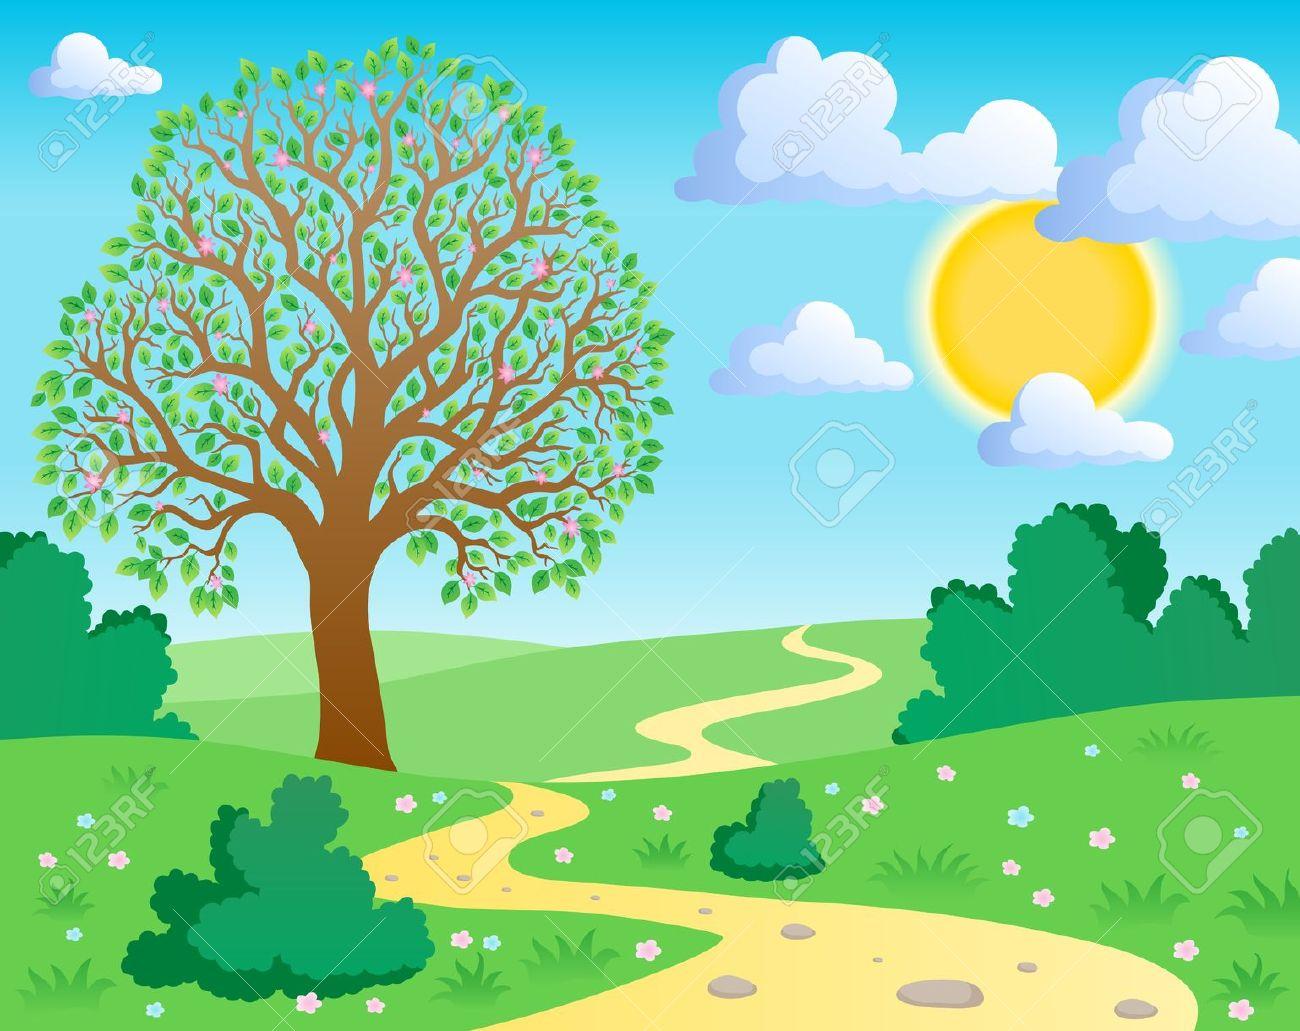 Free scene cliparts download. Nature clipart